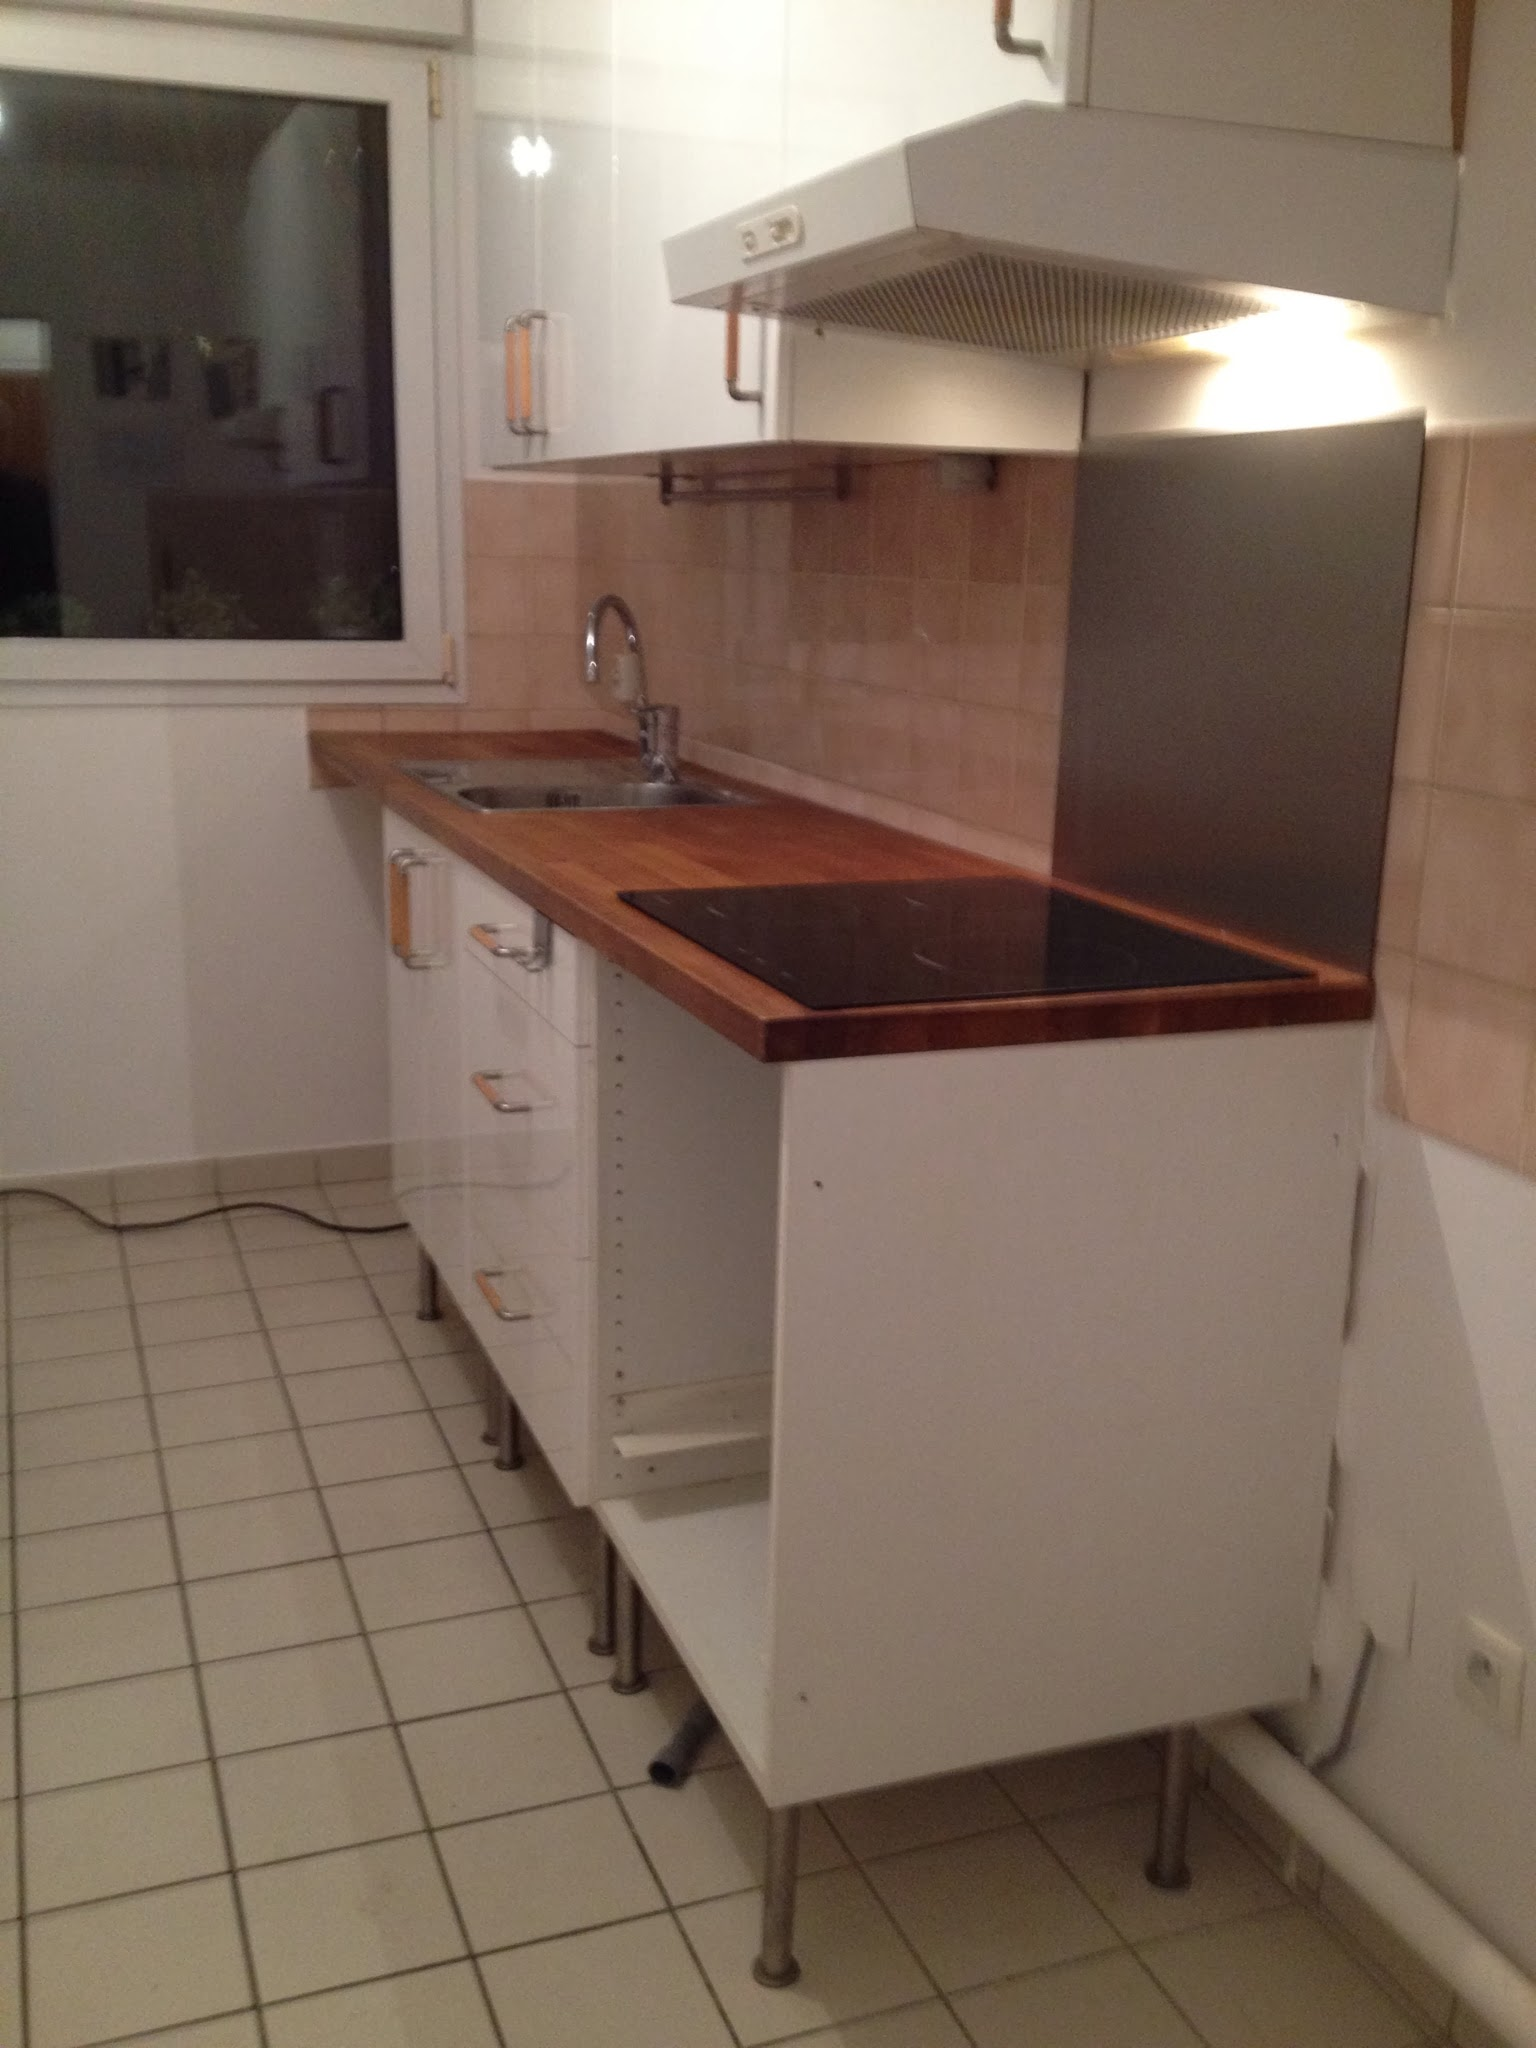 installer cuisine ikea affordable st tiroir mtallique avec glissires g enlever installer et. Black Bedroom Furniture Sets. Home Design Ideas